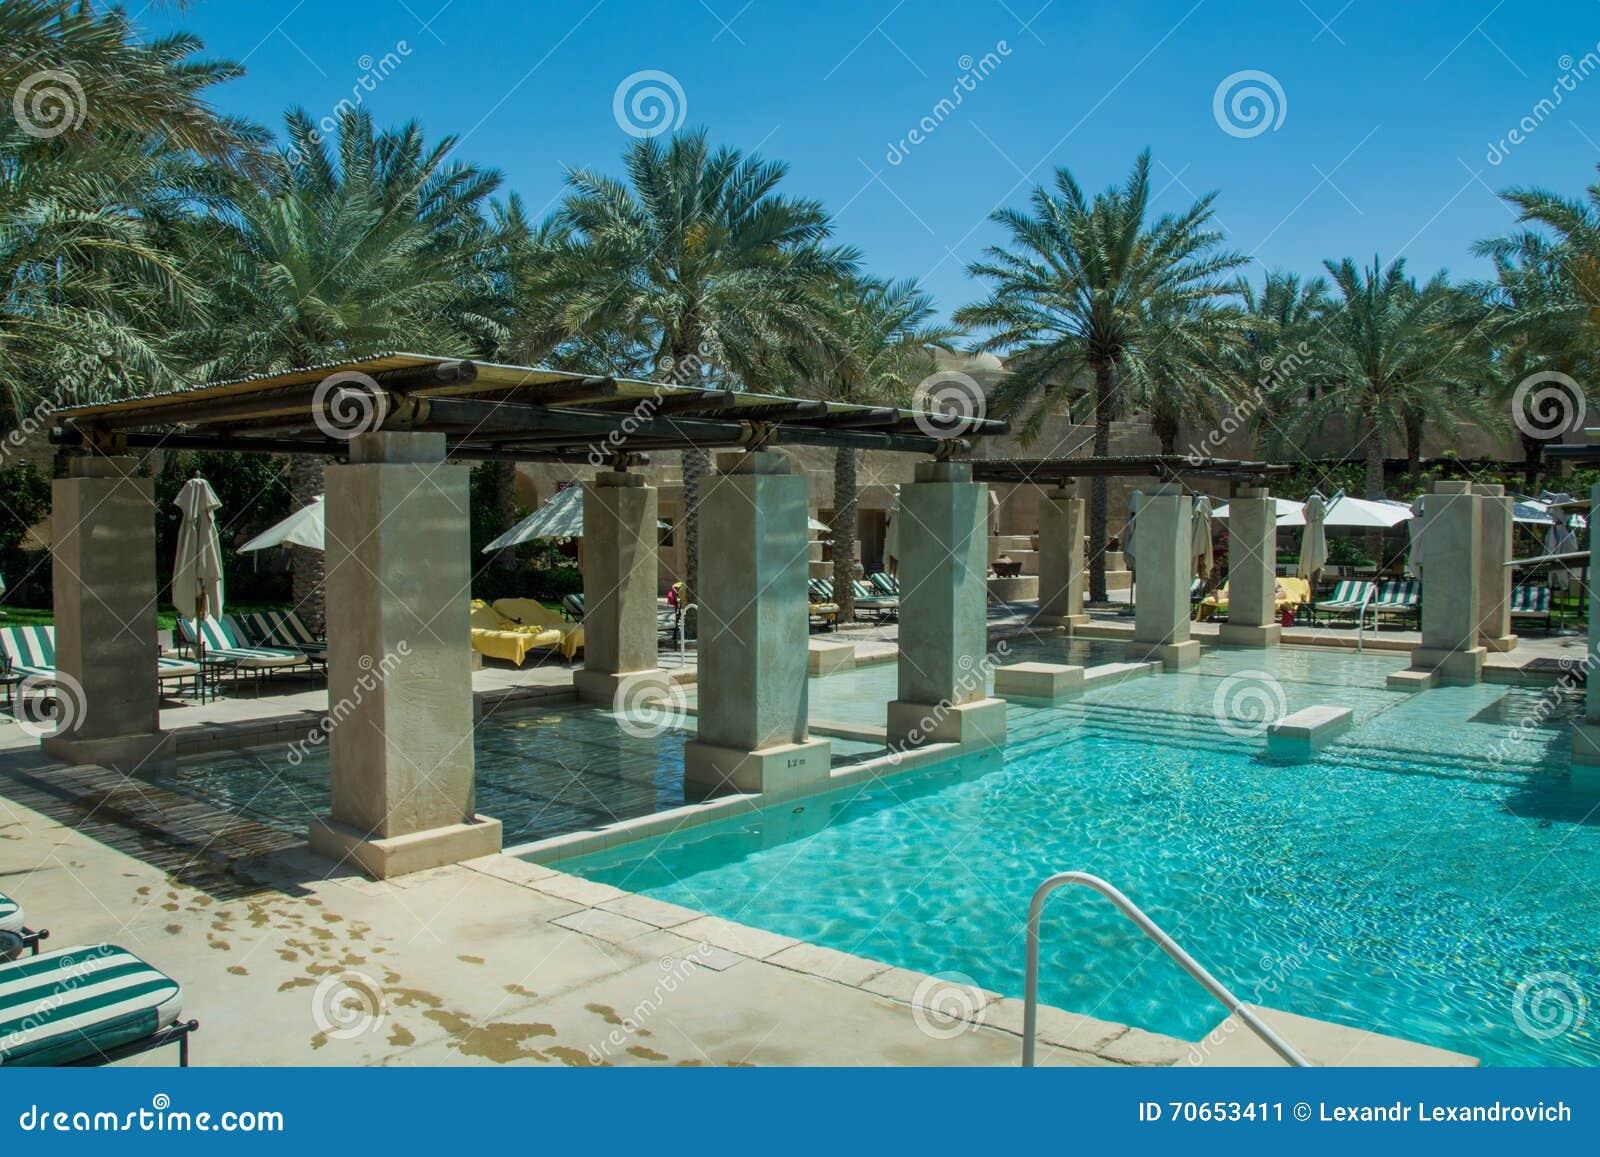 Amazing Swimming Pool Lounge At Luxury Arabian Desert Resort ...